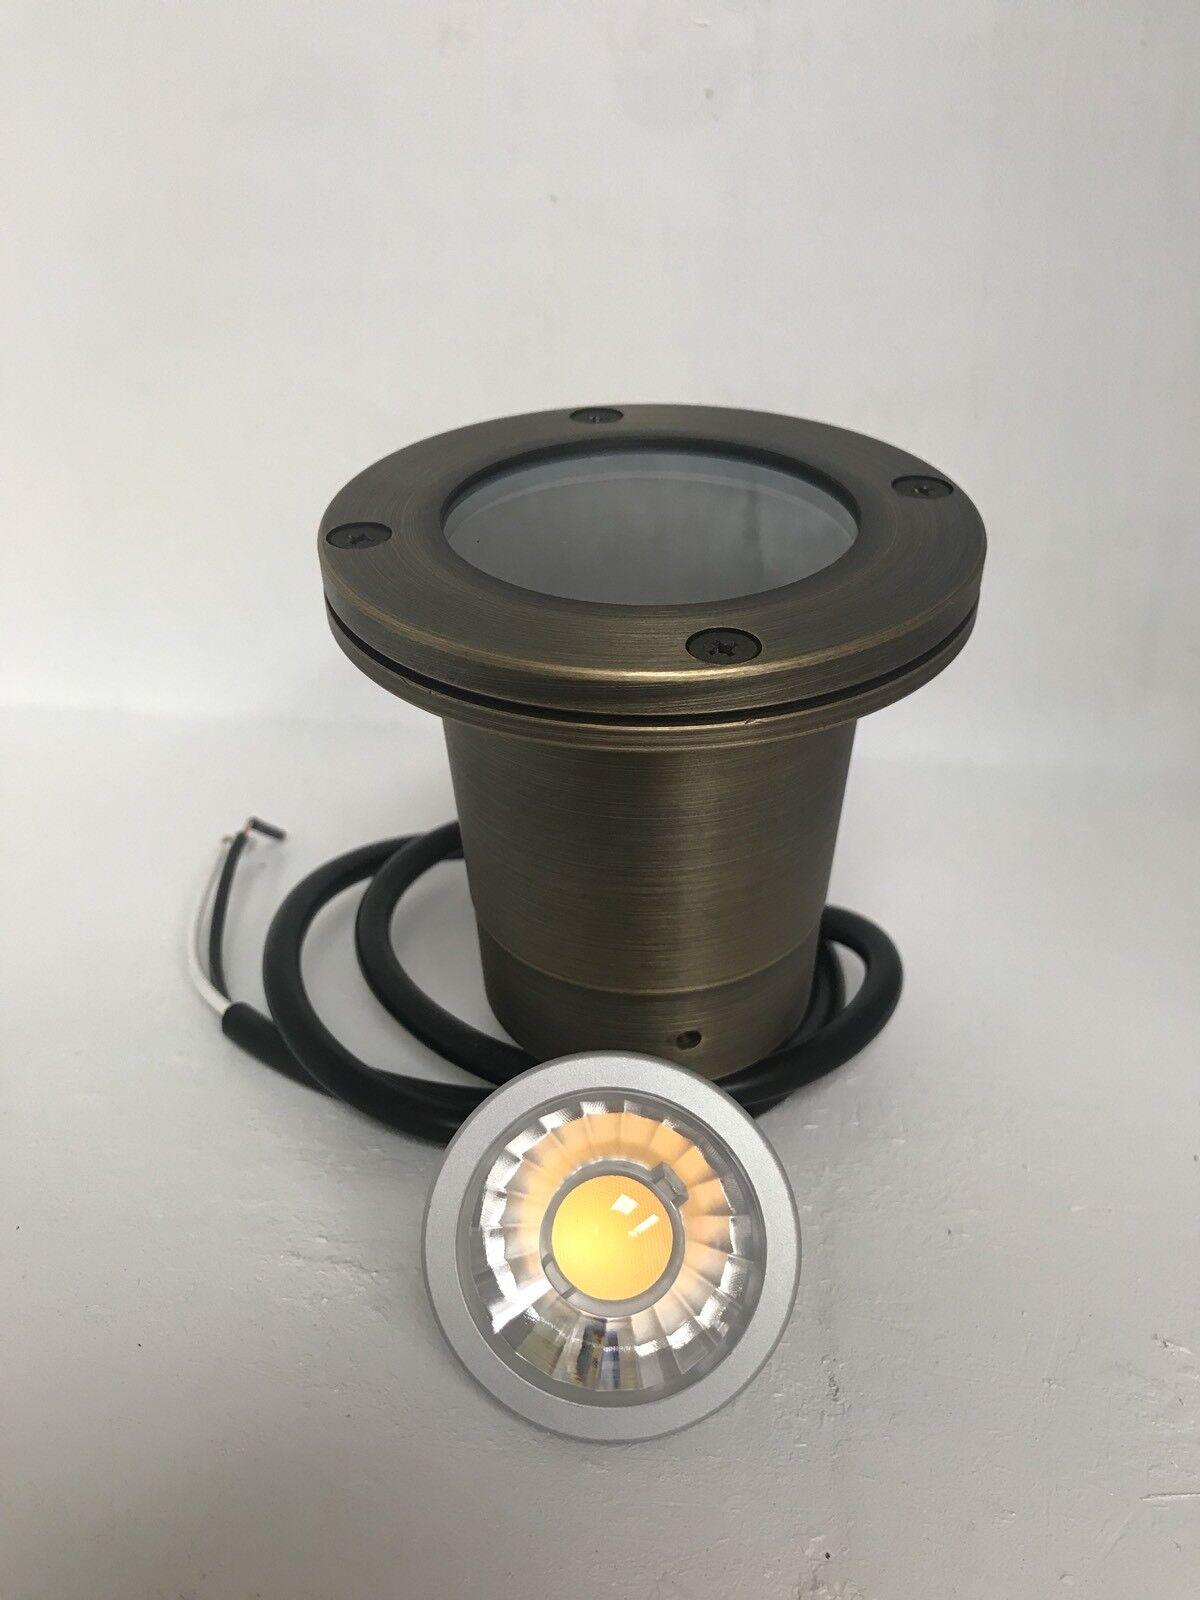 LED Low Voltage Solid brass well light- Outdoor Landscape Lighting W MR16 Bulb